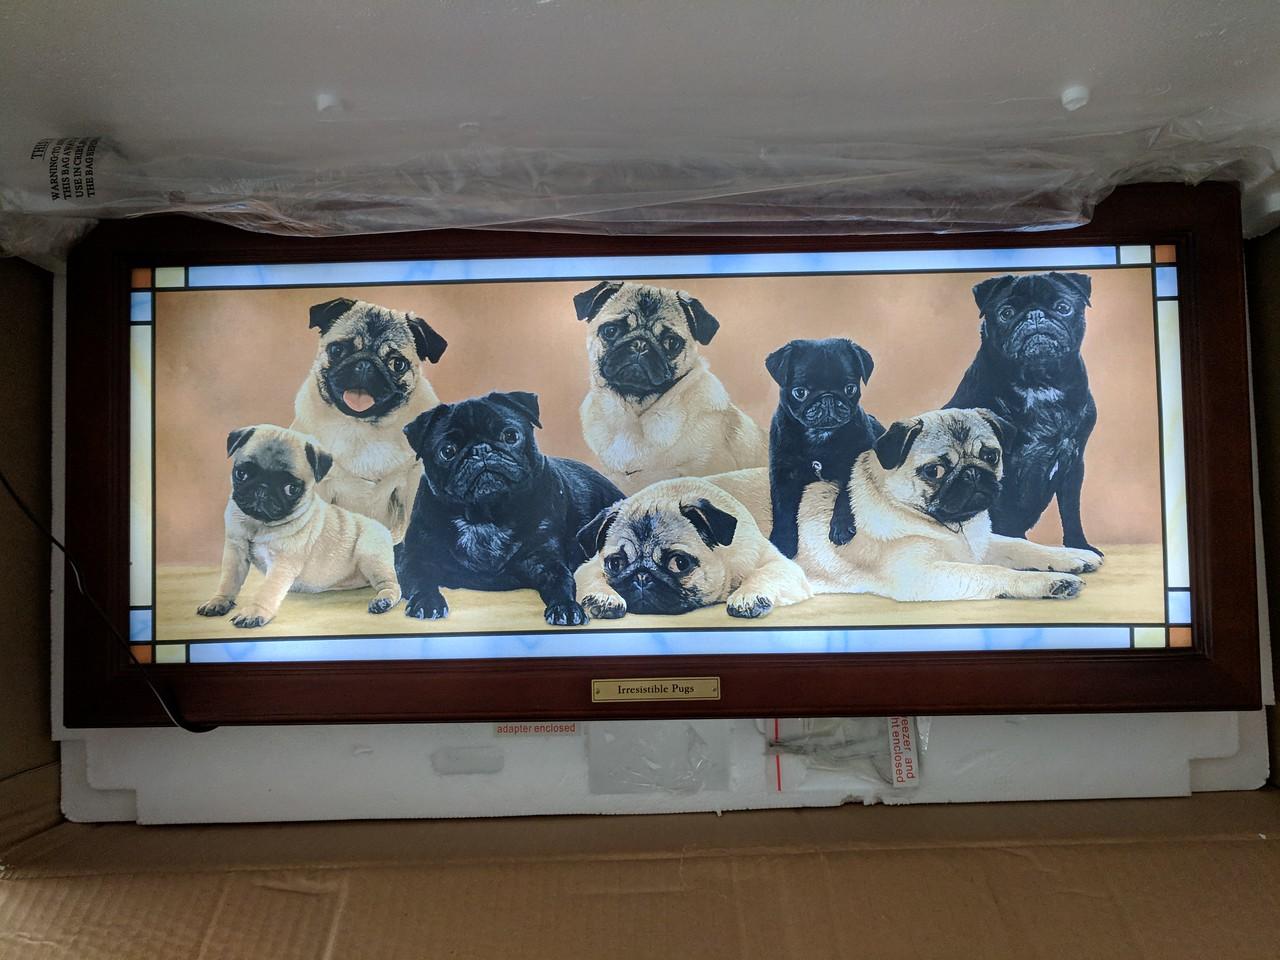 Irresistible Pugs - Light Up Wall Hanging